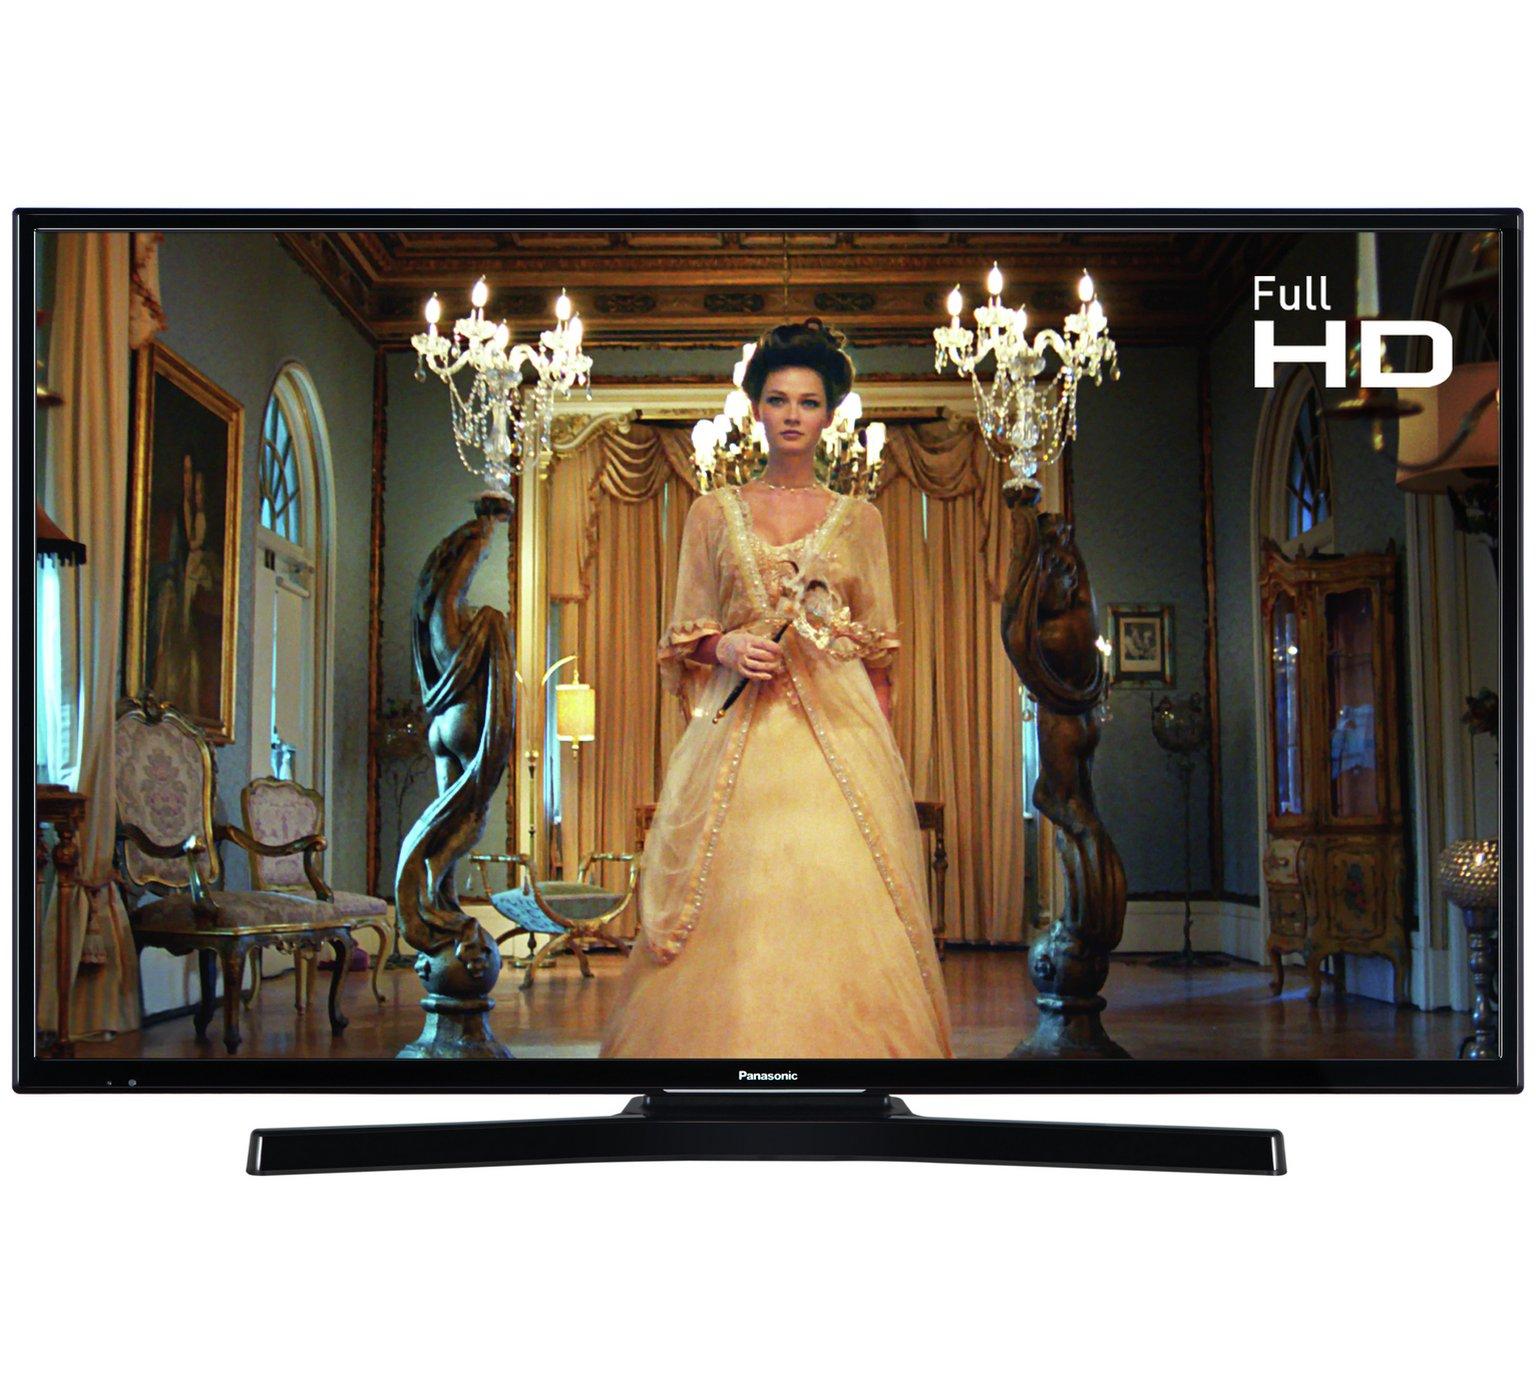 Panasonic 43 Inch 43TX-43E302 Full HD TV